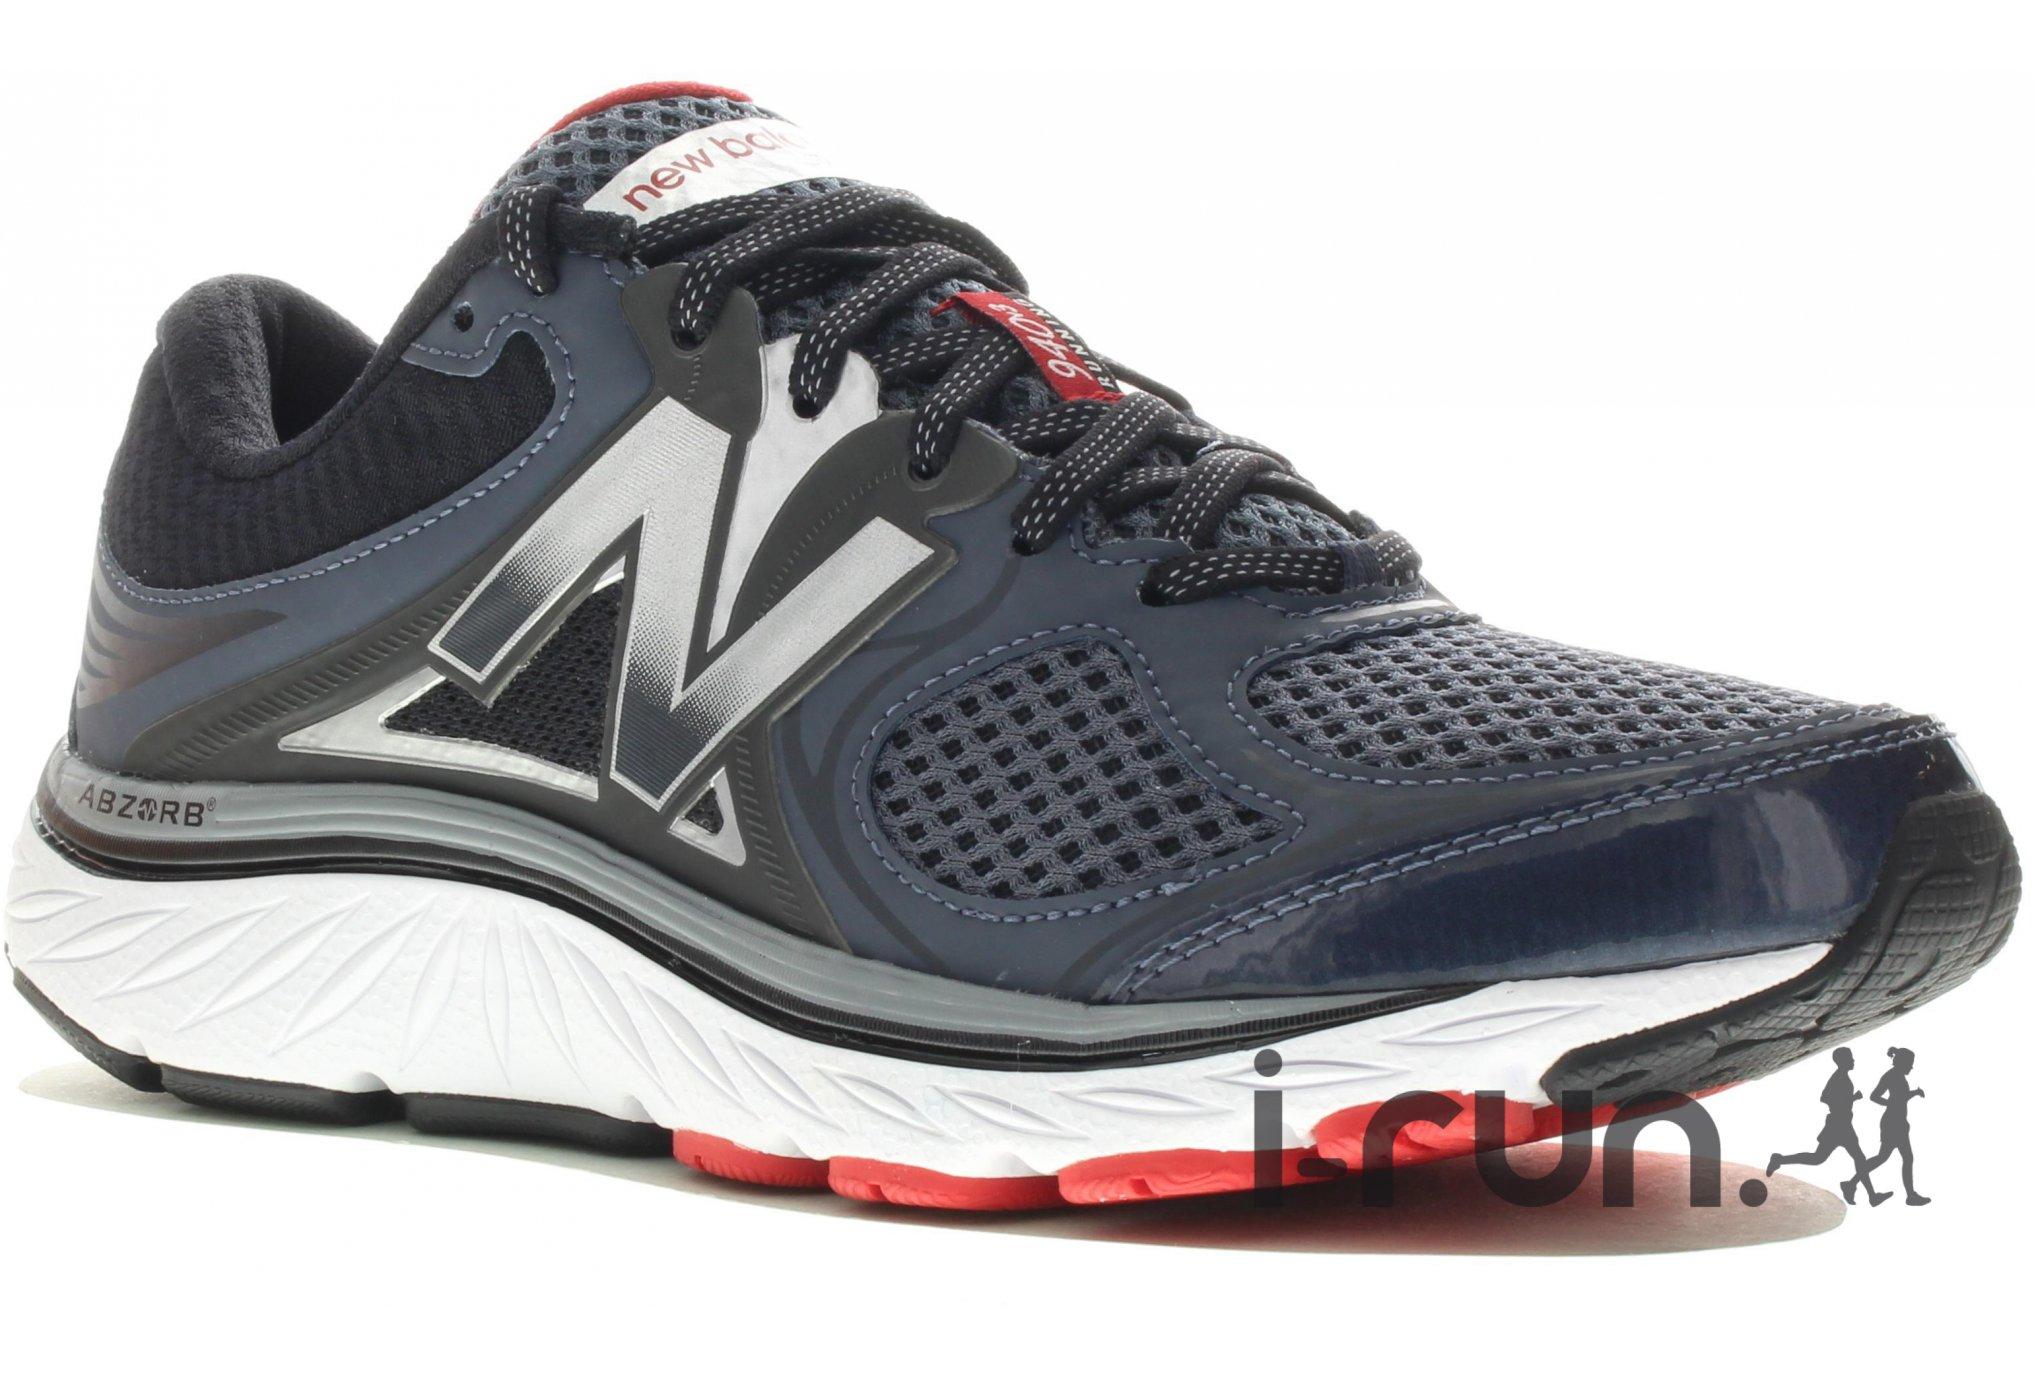 New Chaussures M 940 V3 Resathlon Balance Homme XwqCTXdH